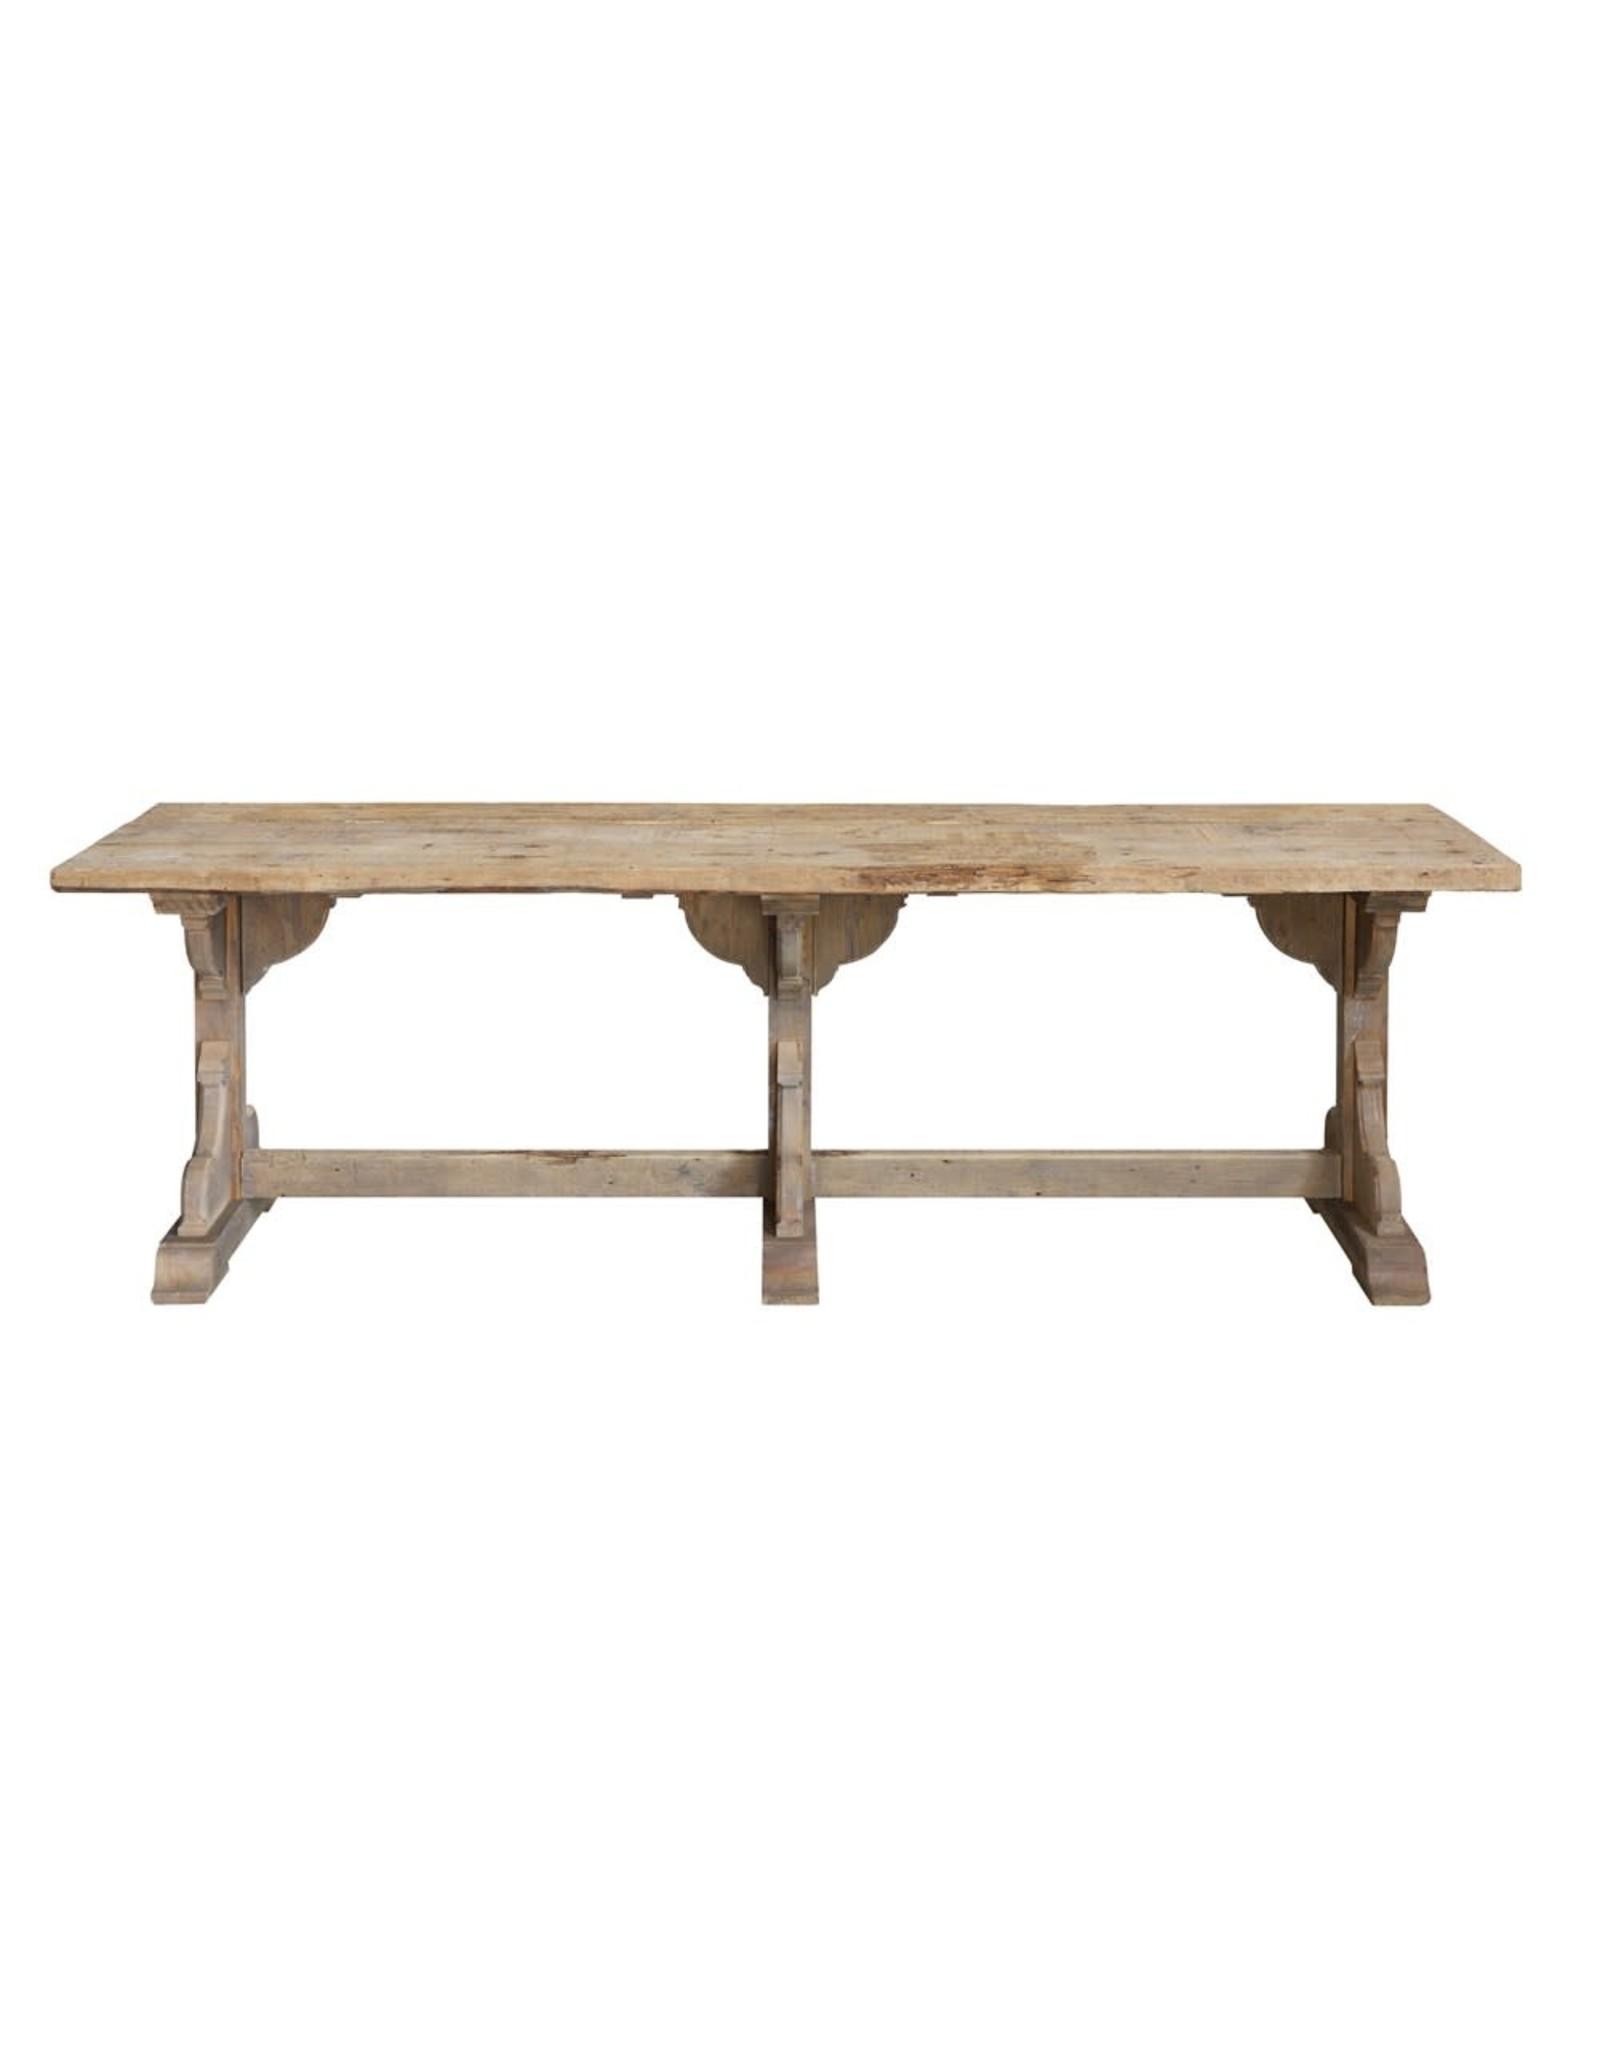 "Creative Co-op 97"" x 29 x 30 Reclaimed Wood Table"